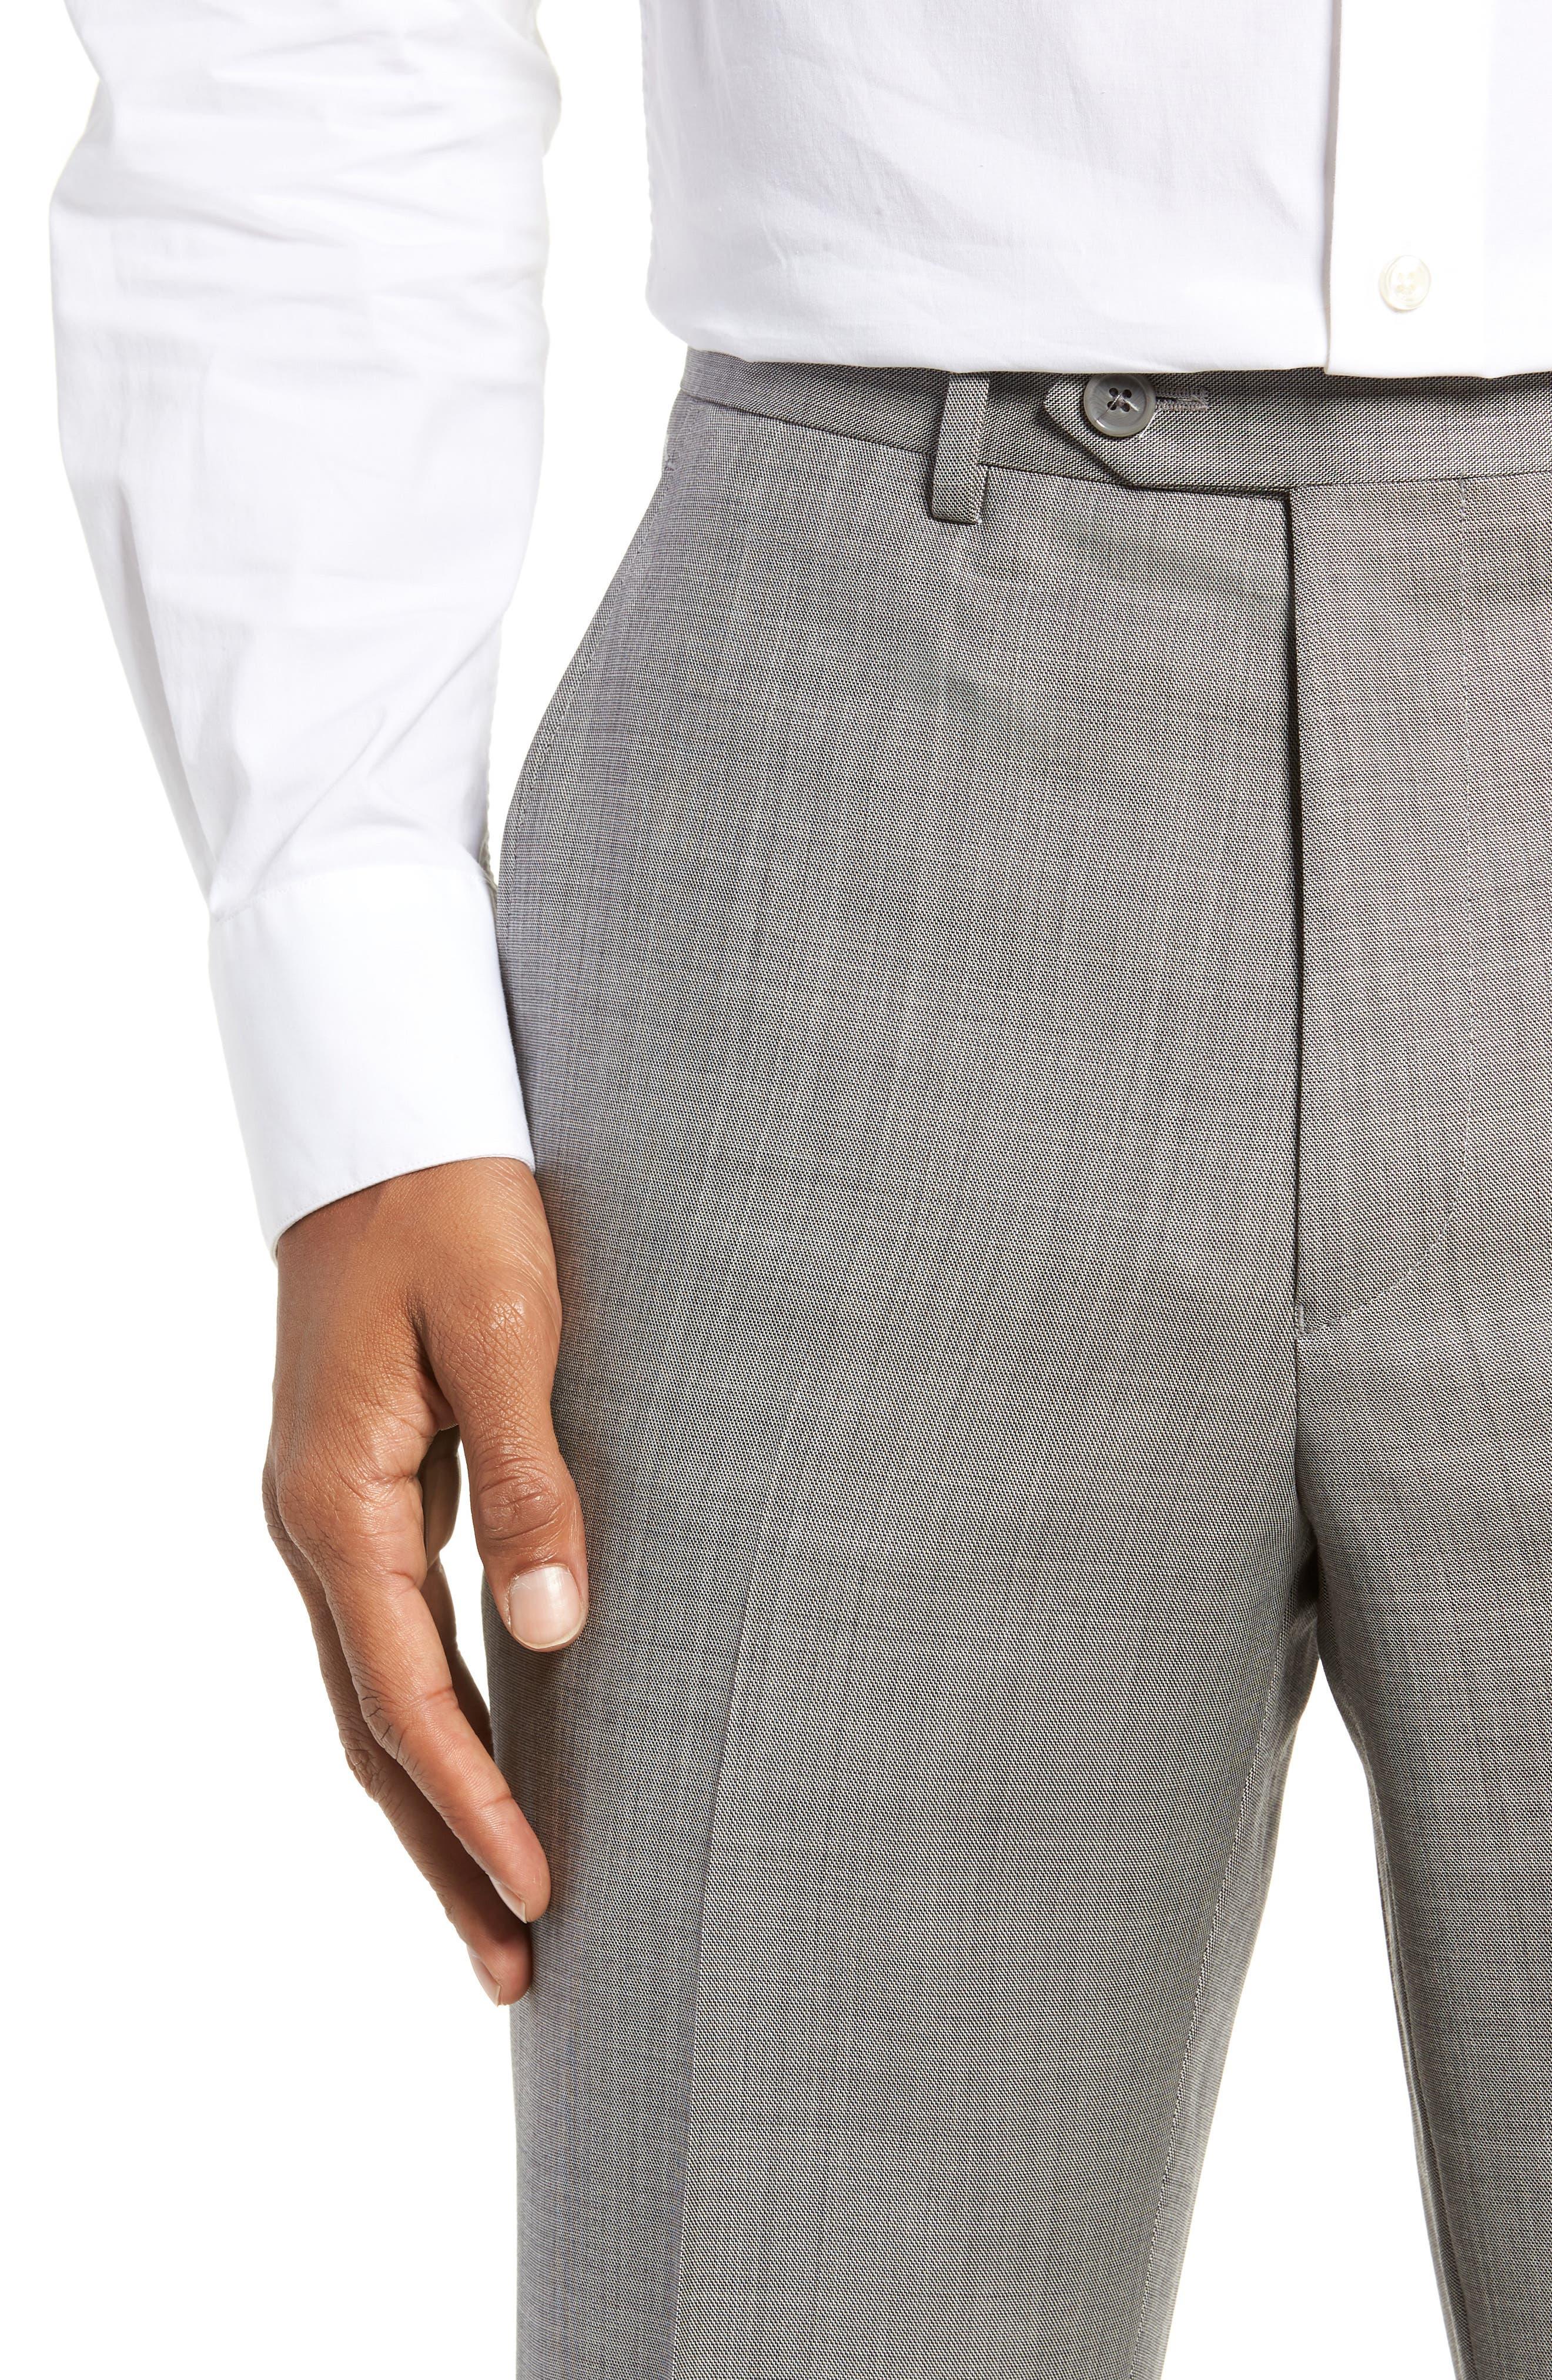 Flat Front Sharkskin Wool Trousers,                             Alternate thumbnail 4, color,                             LIGHT GREY